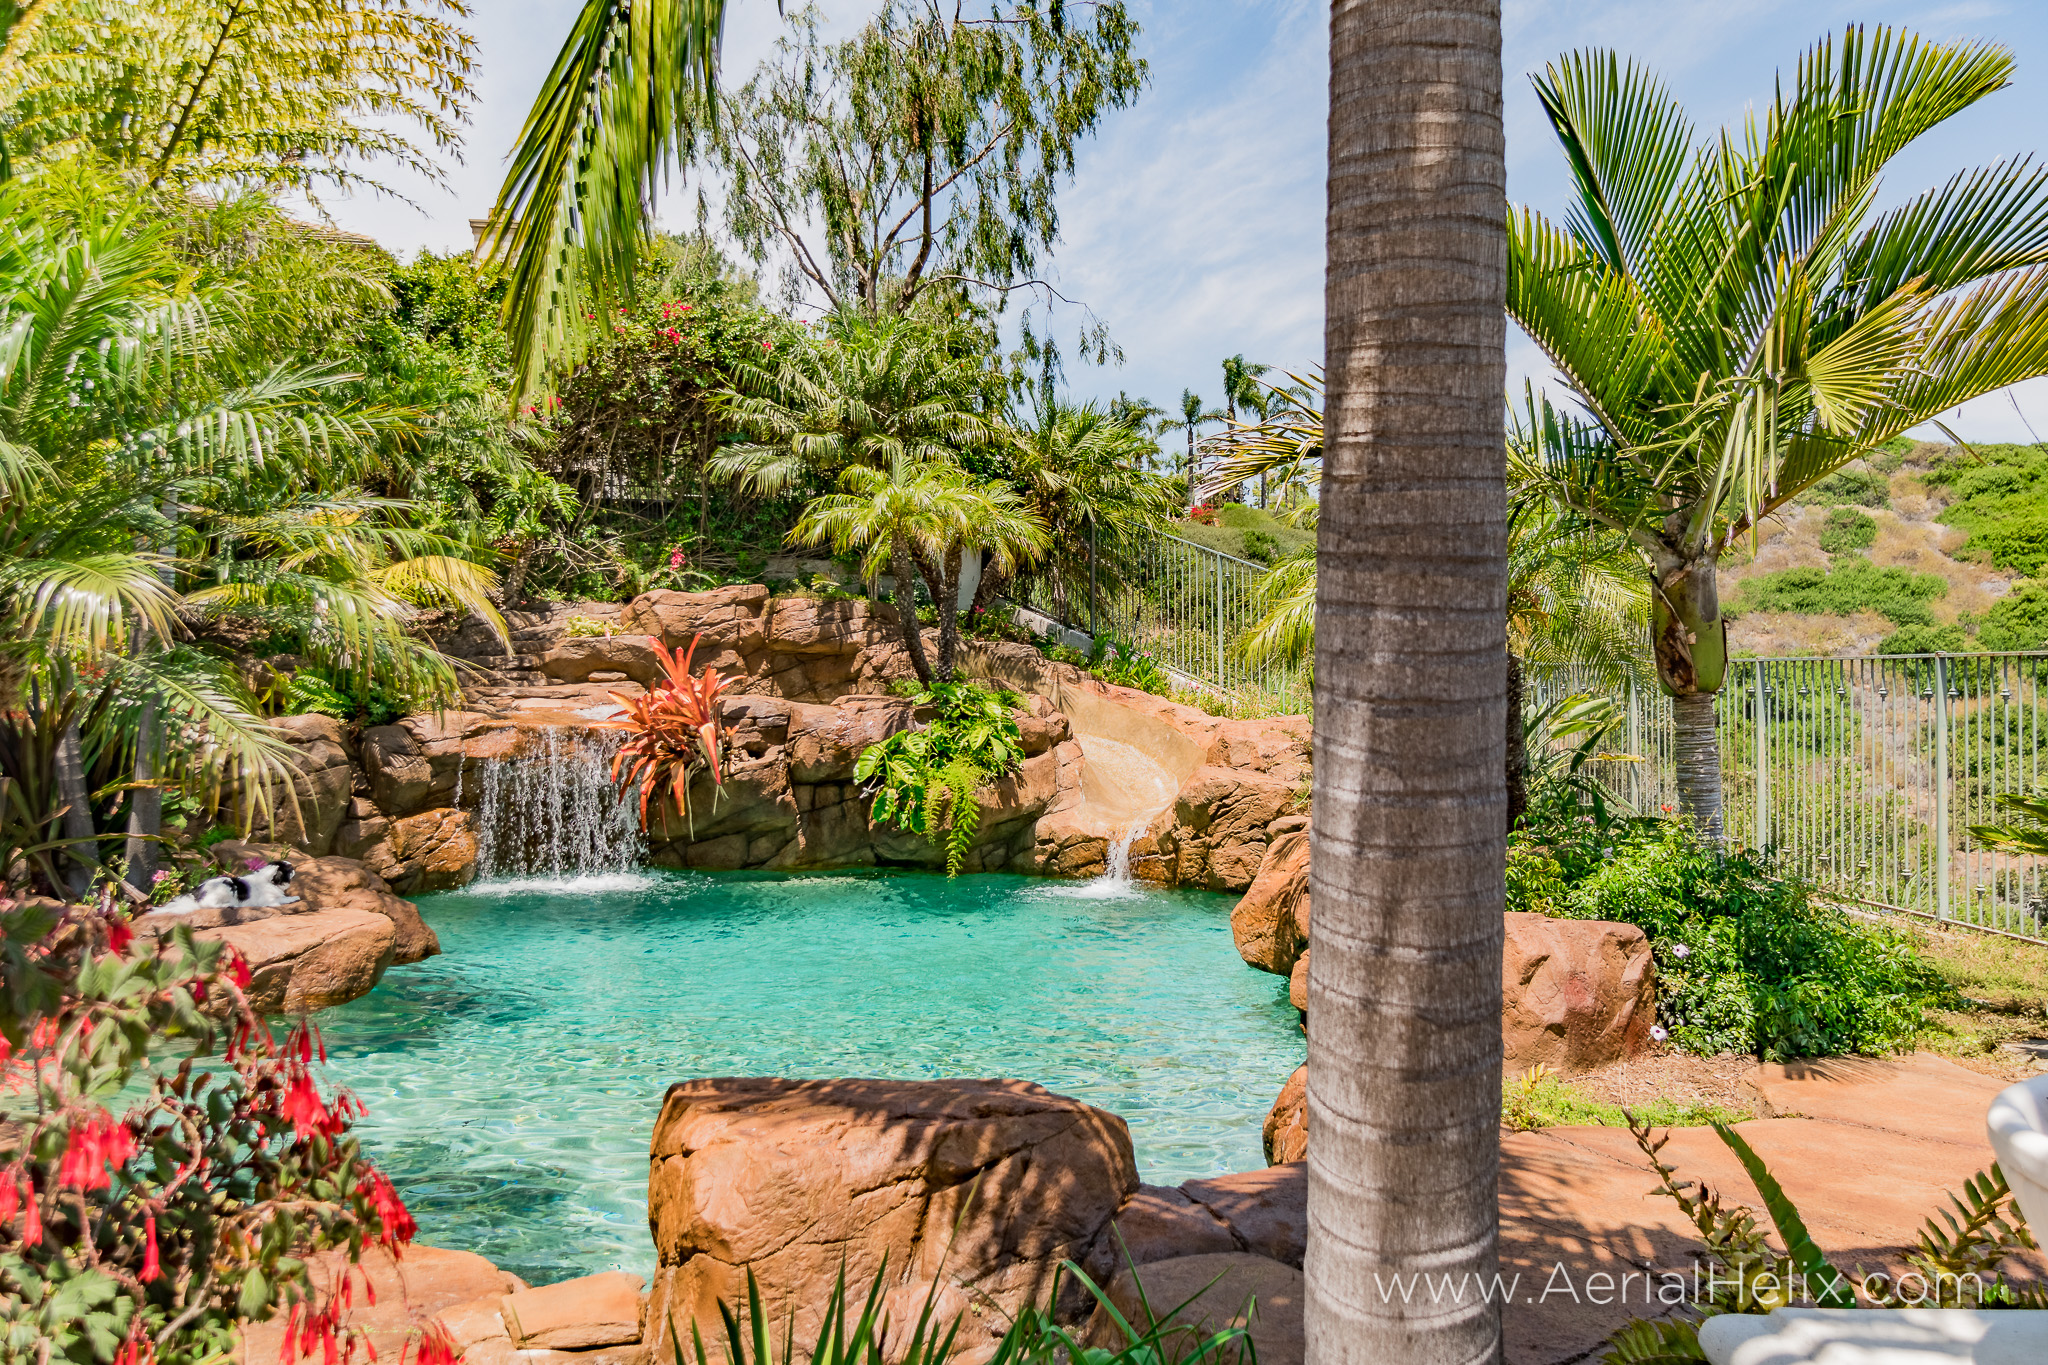 HELIX - Vista Montemar - real-estate-photographer-5.jpg